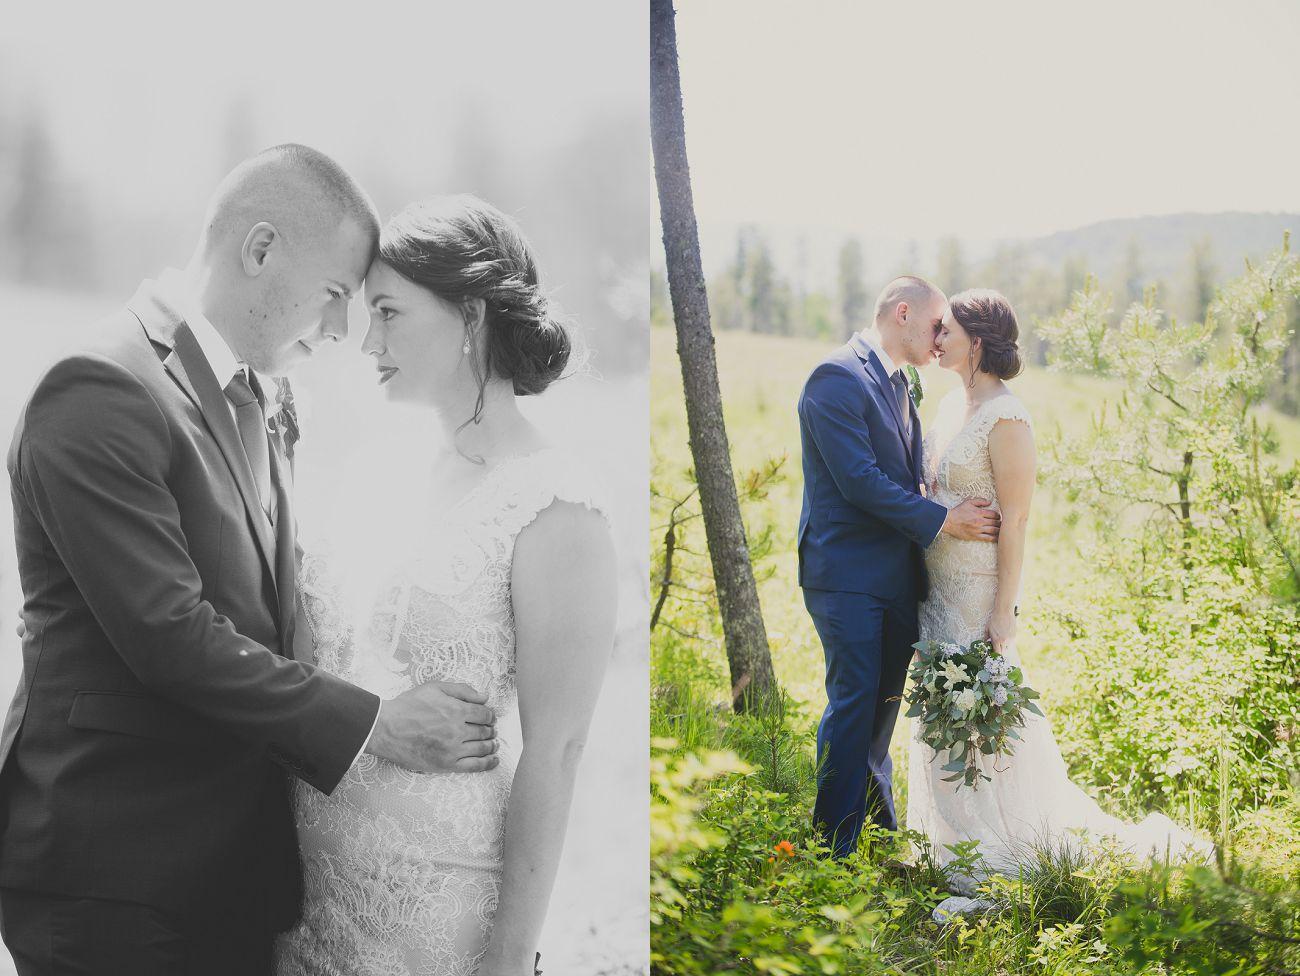 Jennifer_Mooney_Photo_Glacier_Park_Weddings_Elopement_00036.jpg